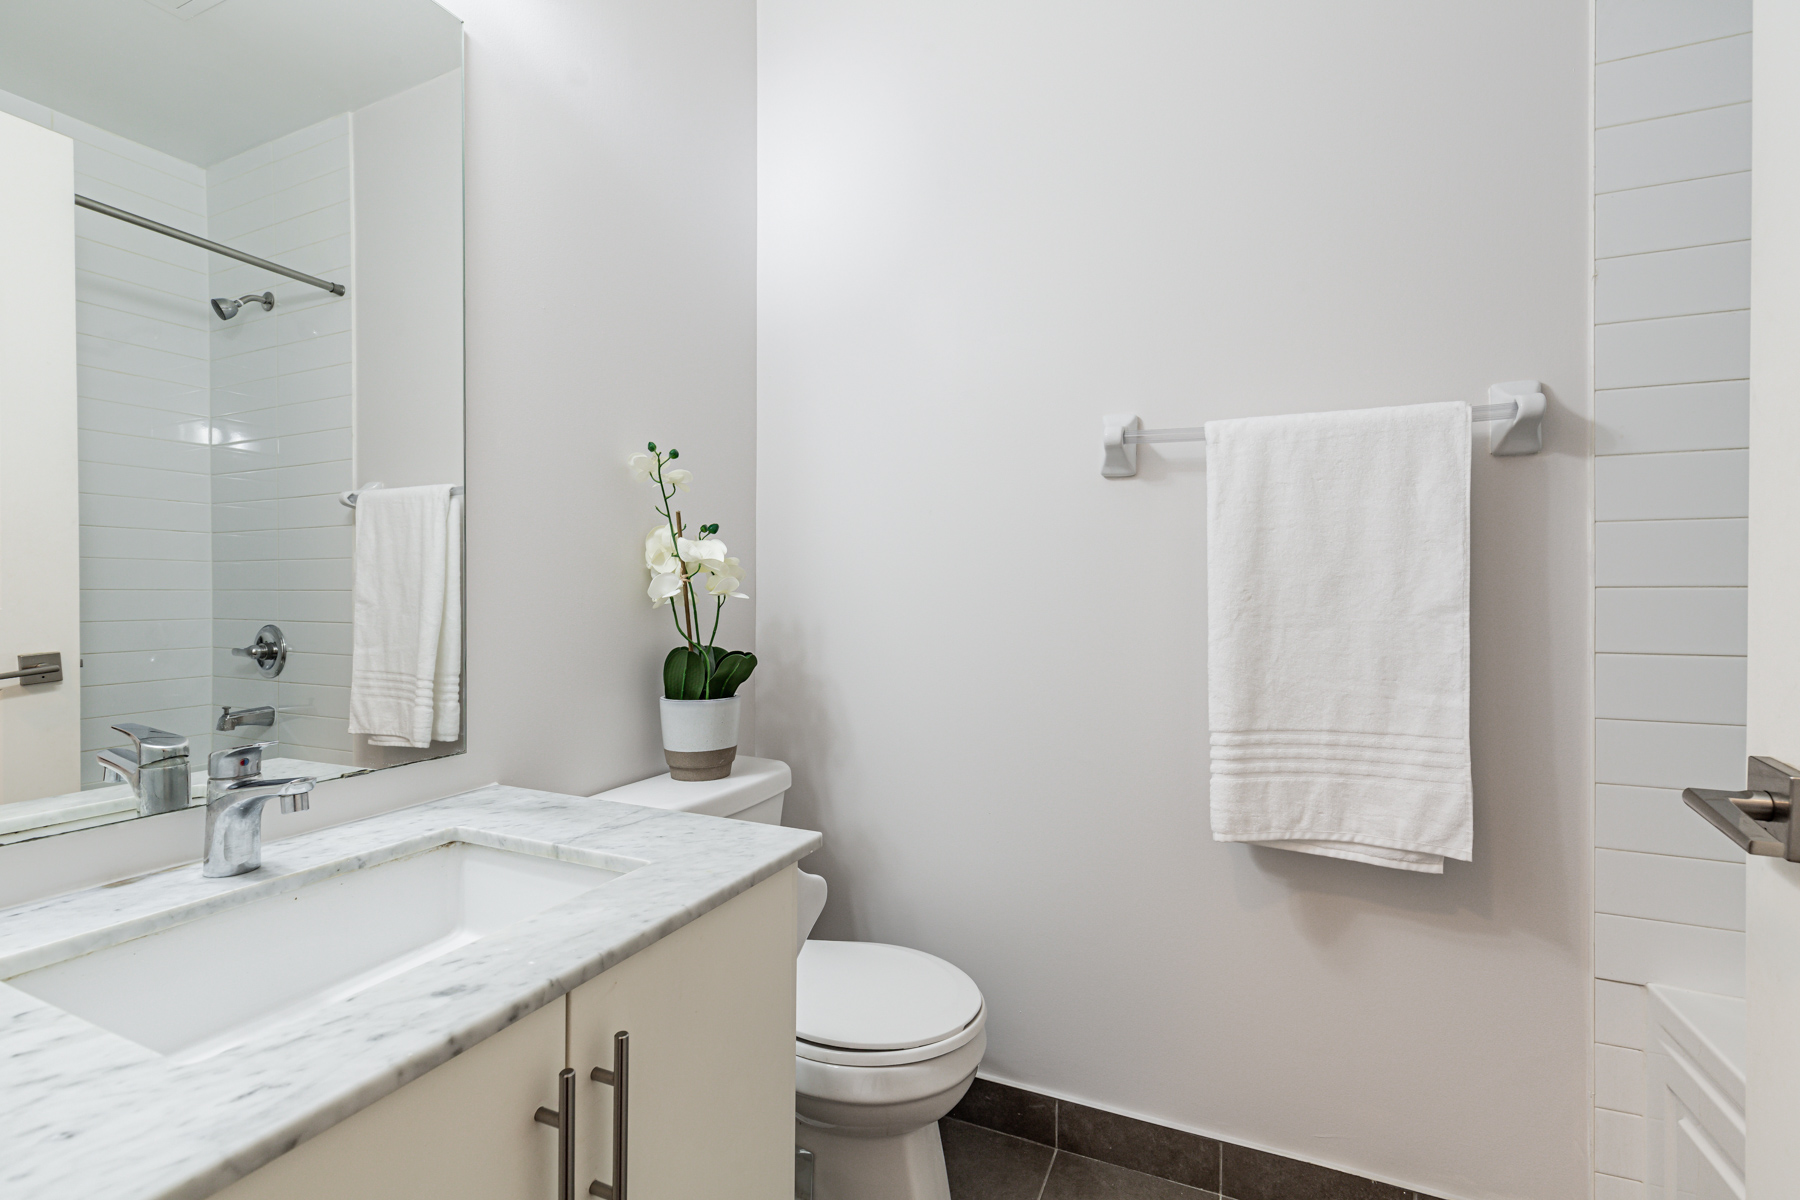 Newly painted gray 3-piece bathroom of 23 Glebe Rd W Unit 918.